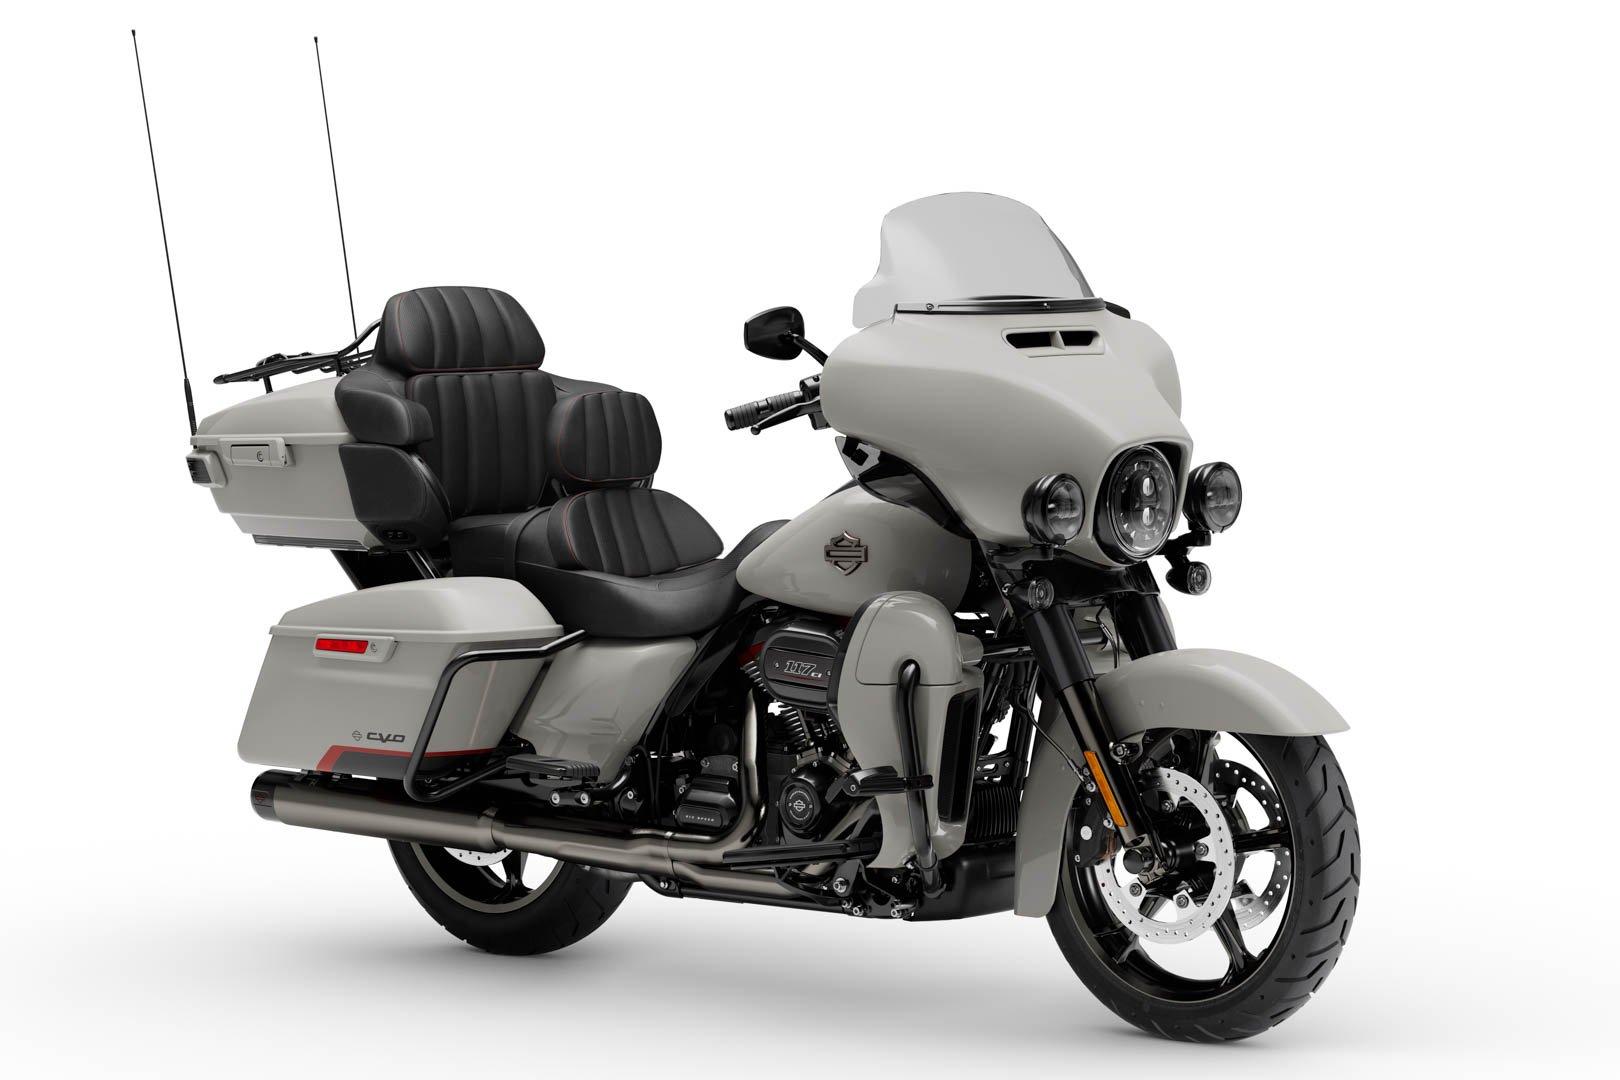 2020 Harley-Davidson CVO Limited